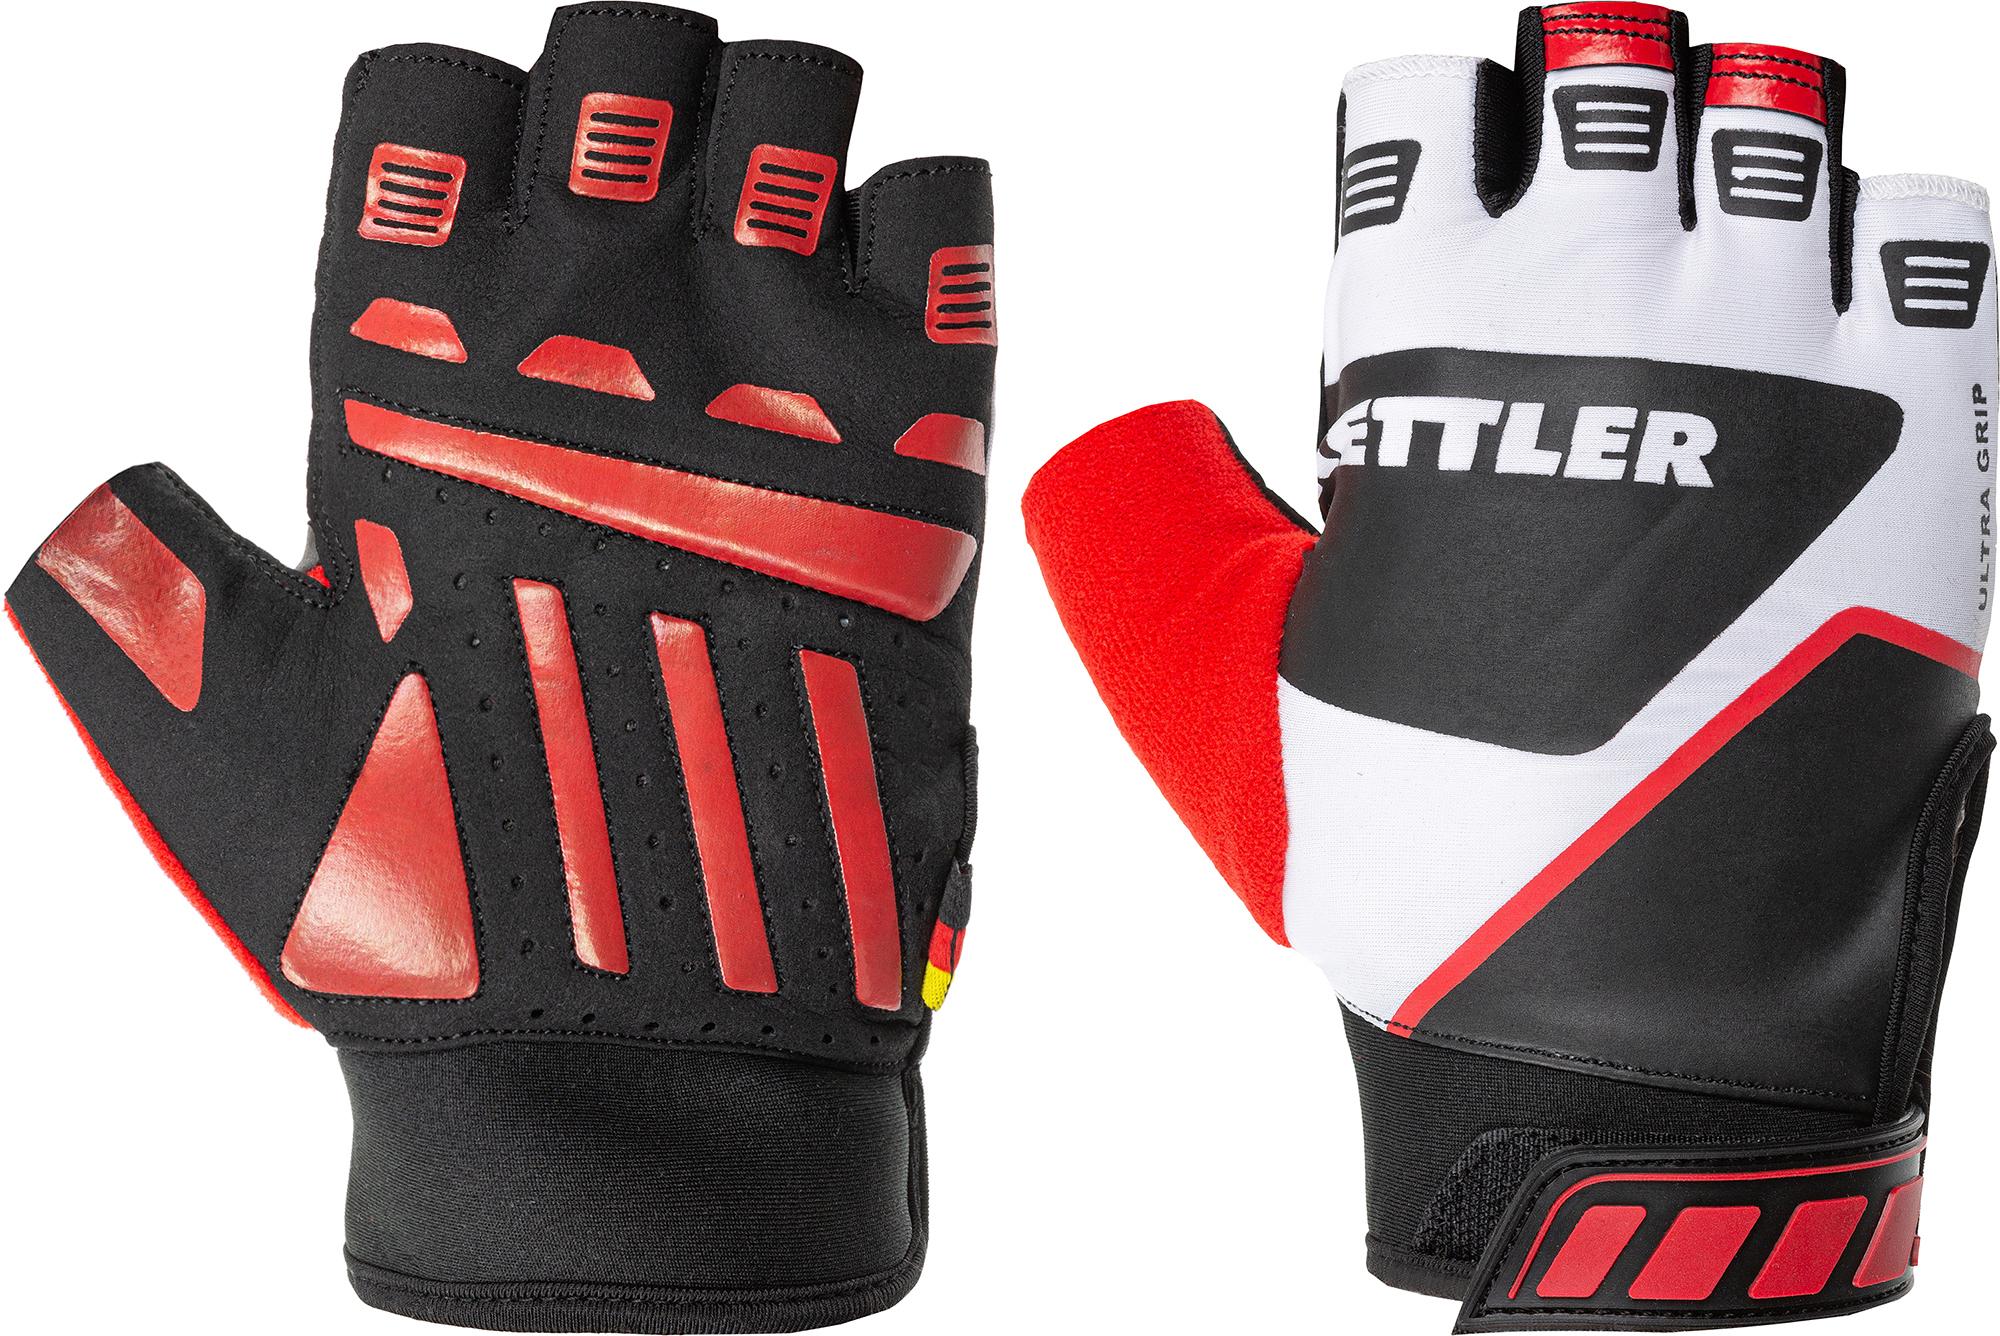 Kettler Перчатки для фитнеса Kettler, размер 9 перчатки jetasafety jle021 9 l12